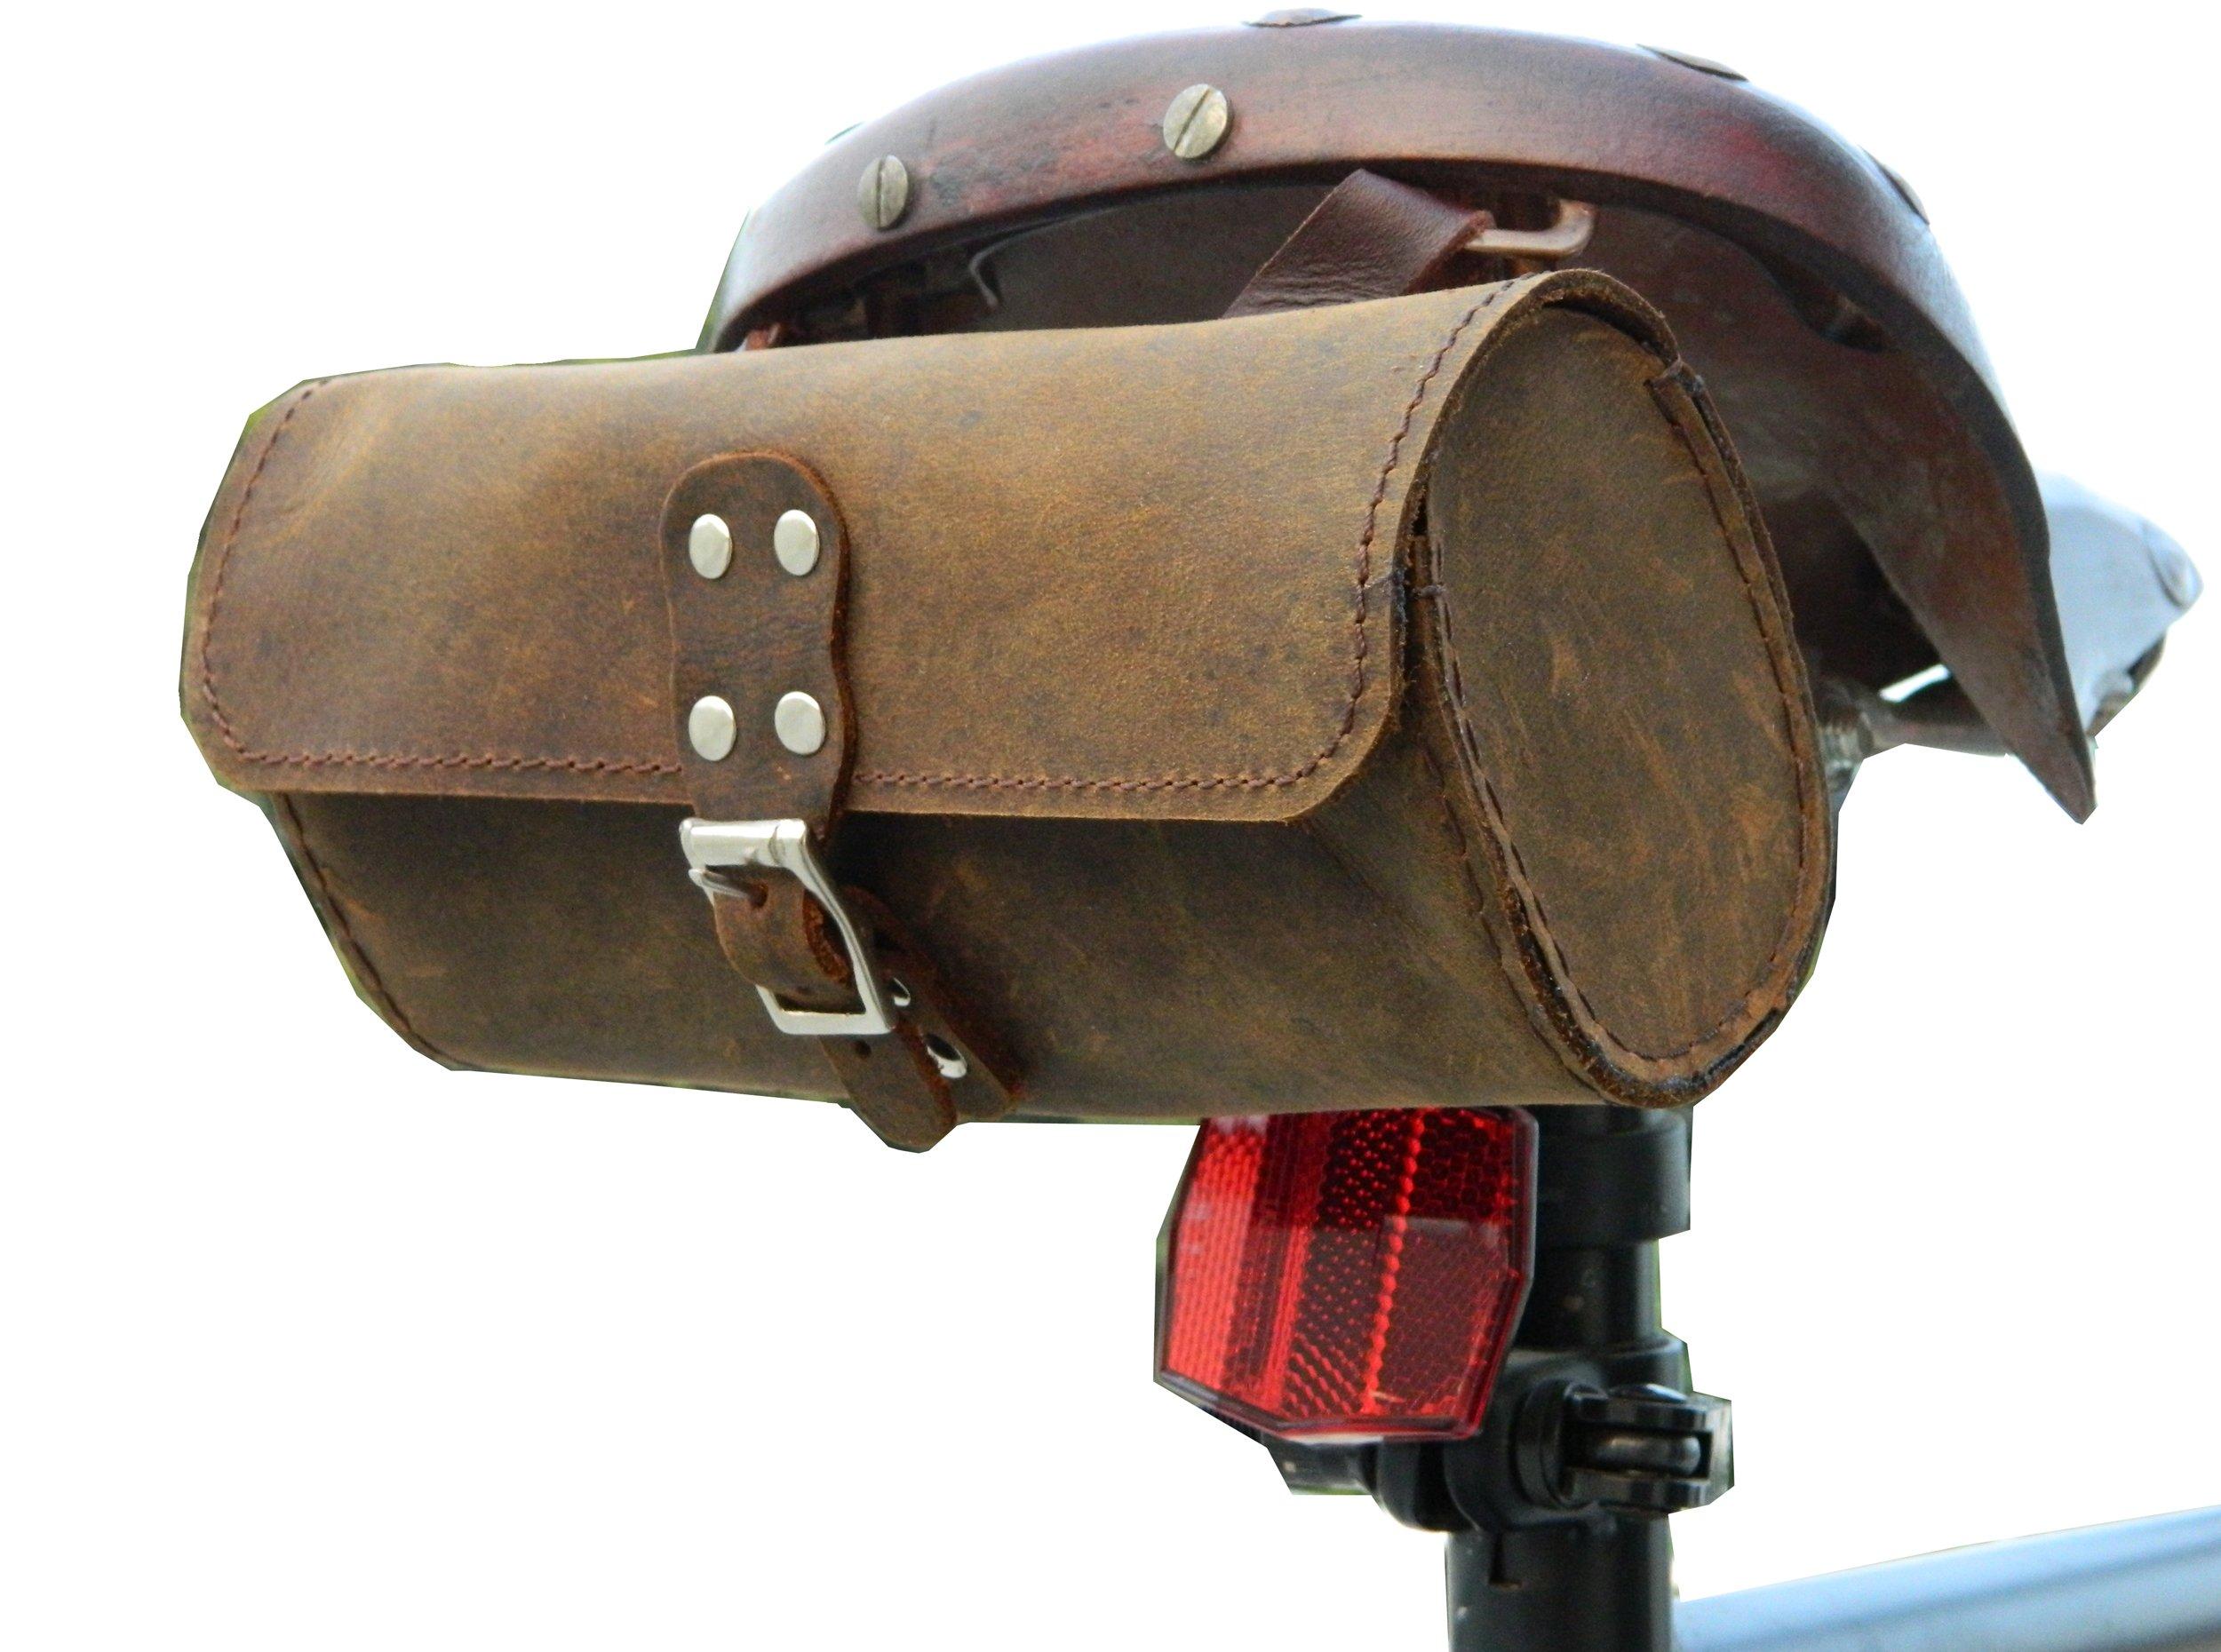 Herte Genuine Leather Bicycle Saddle Bag Utility Tool Bag Brown